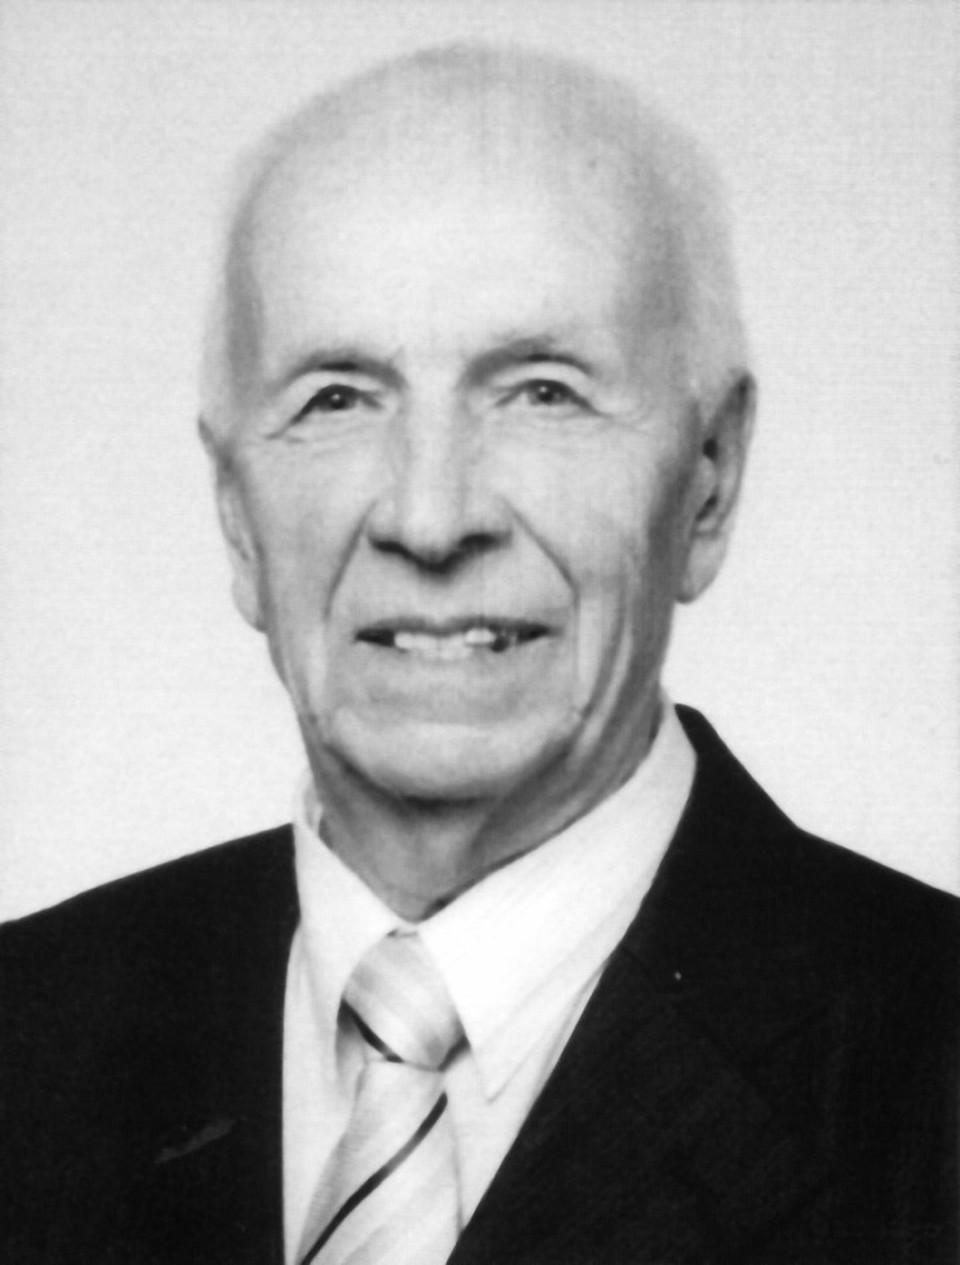 Константину Николаевичу Смирнову был 91 год